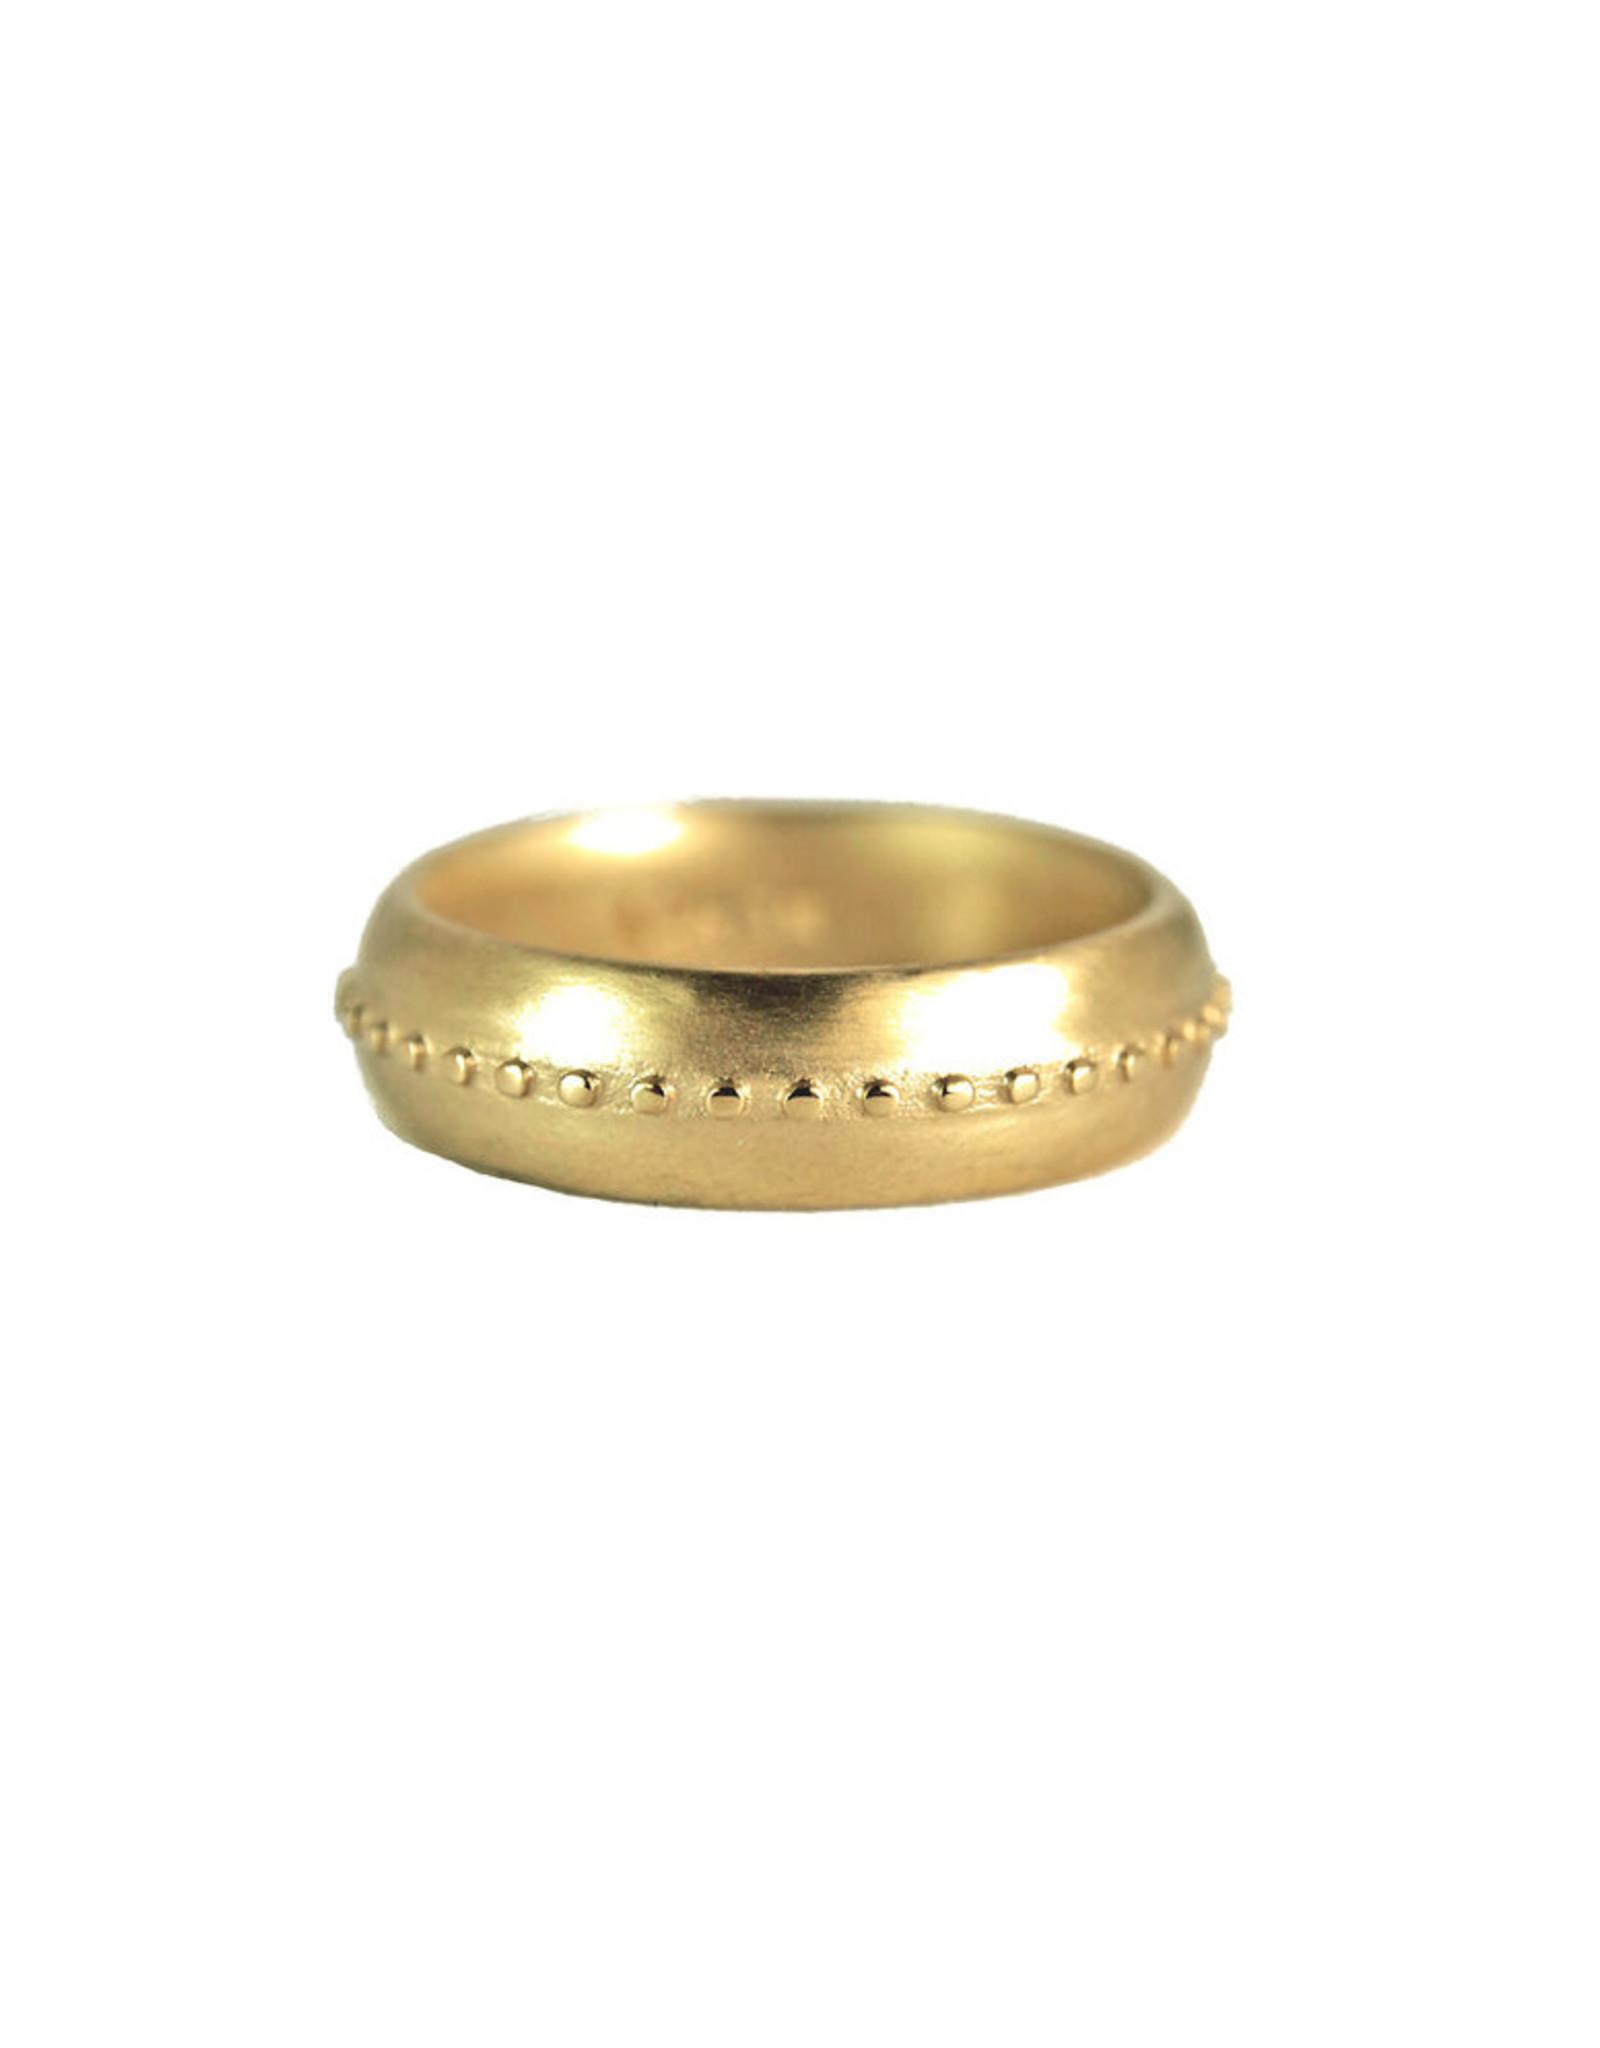 Lorak Jewelry Thick Bead Band - Sz. 6.5